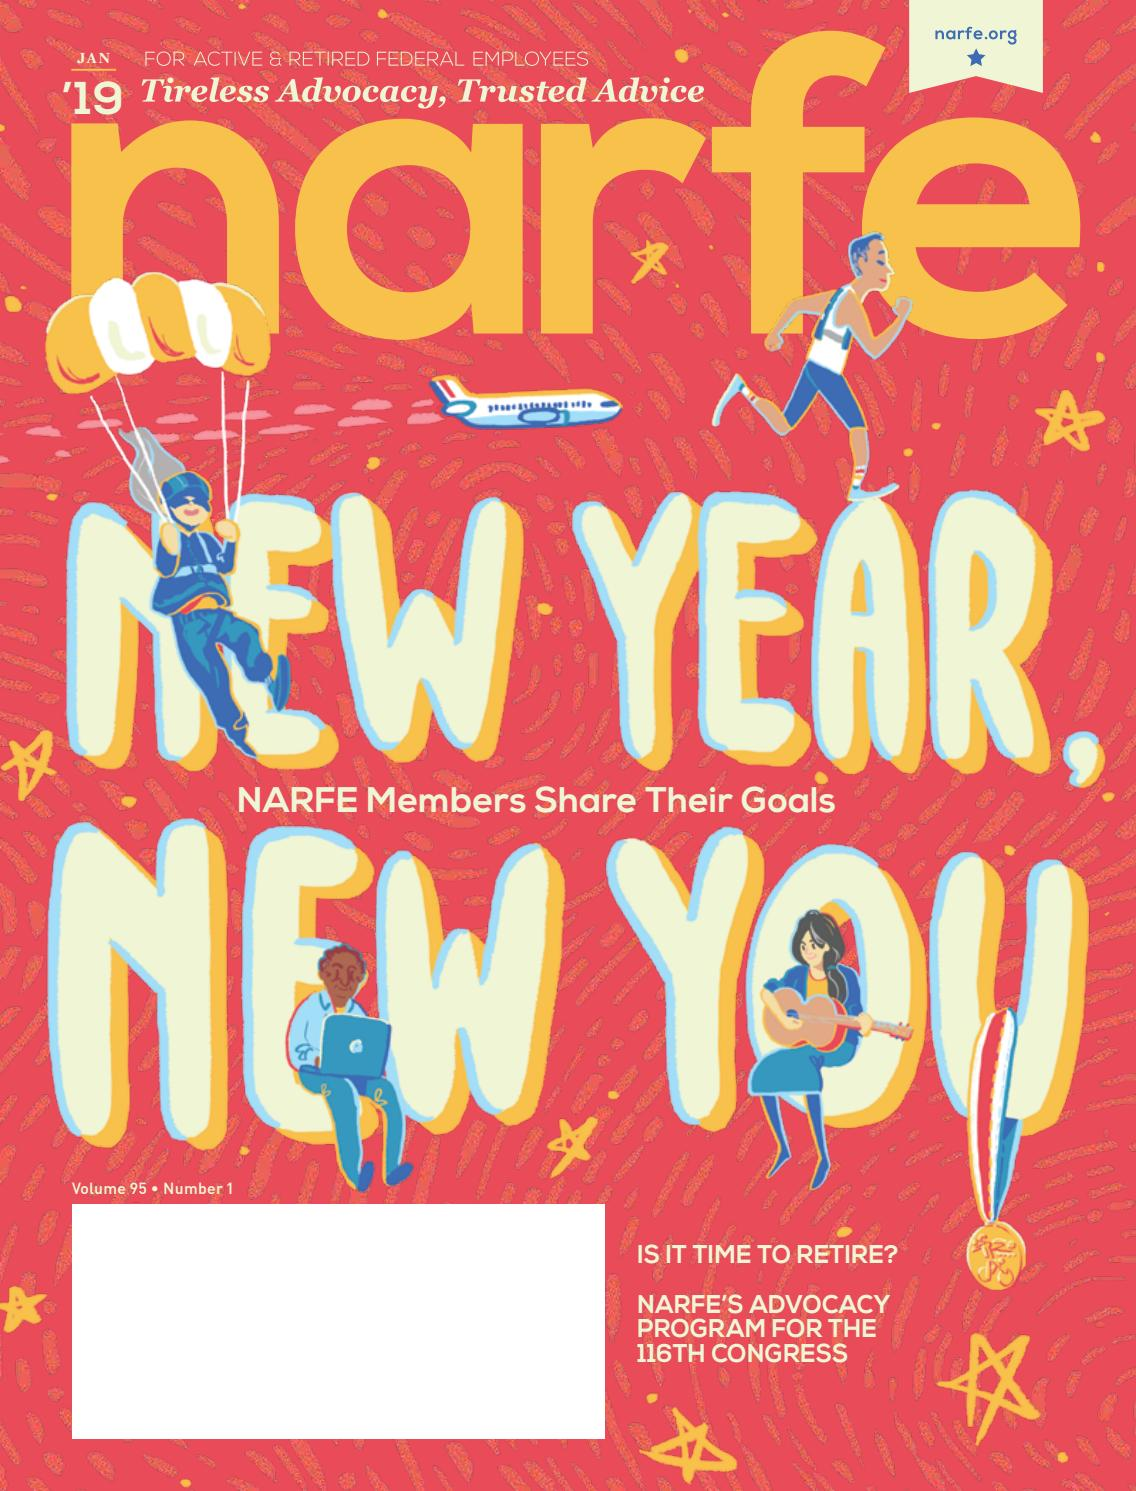 d9836408c9 January 2019 NARFE Magazine by NARFE - issuu